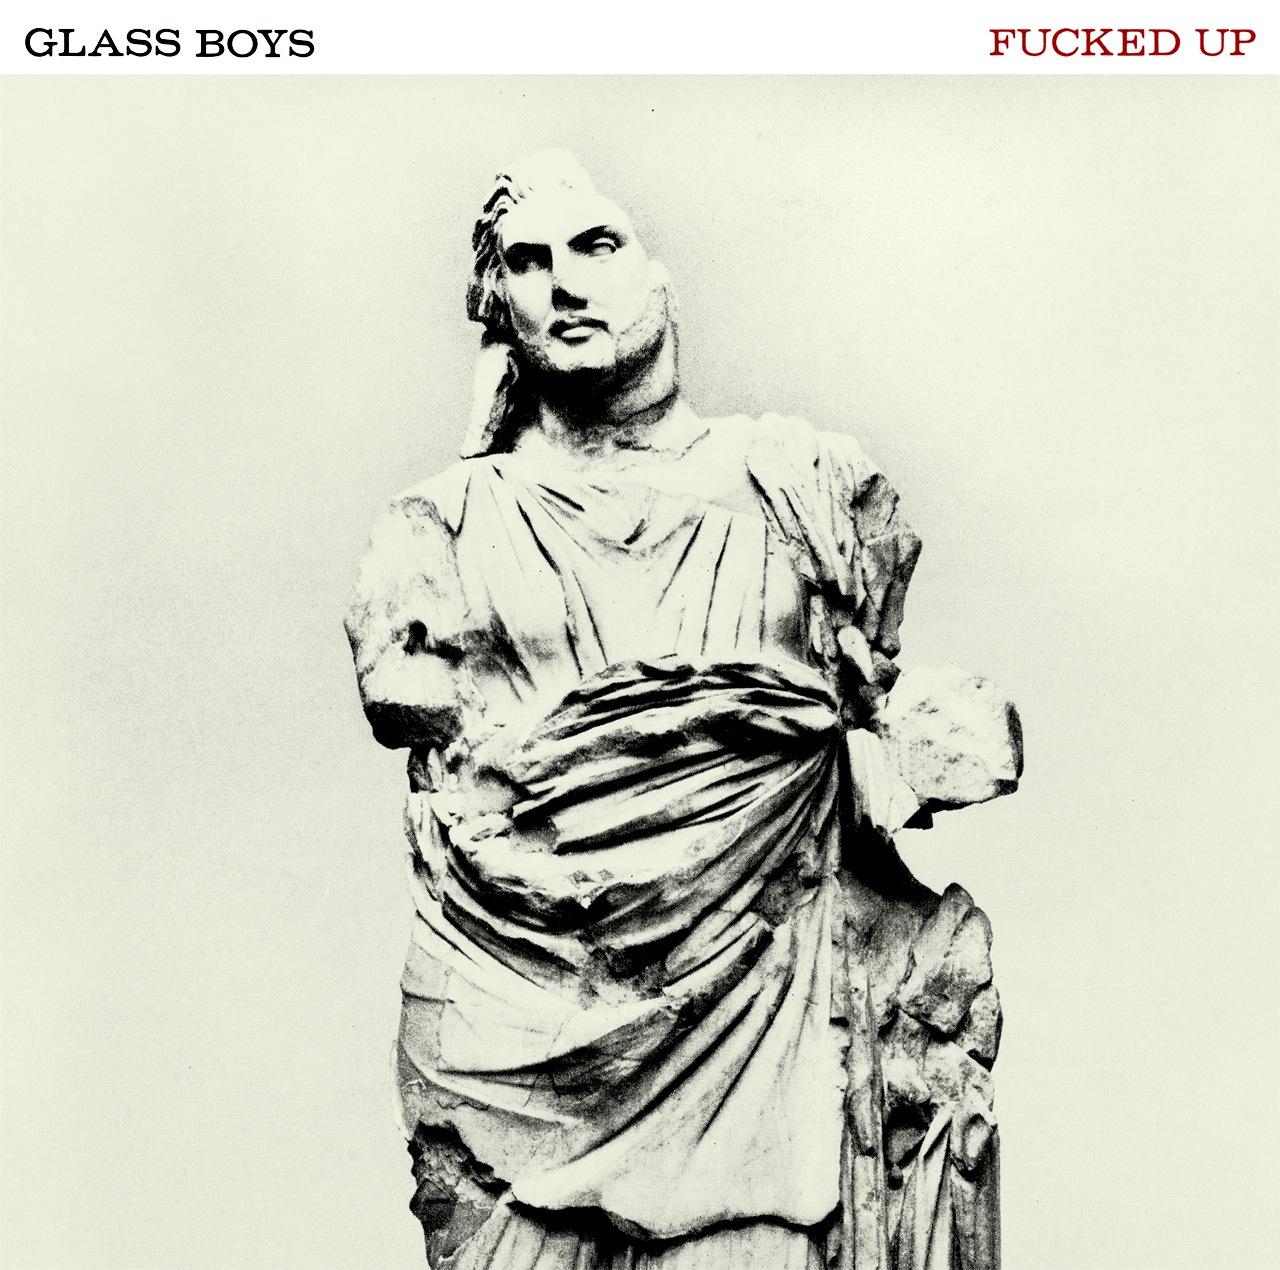 FuckedUp-GlassBoys2.jpg